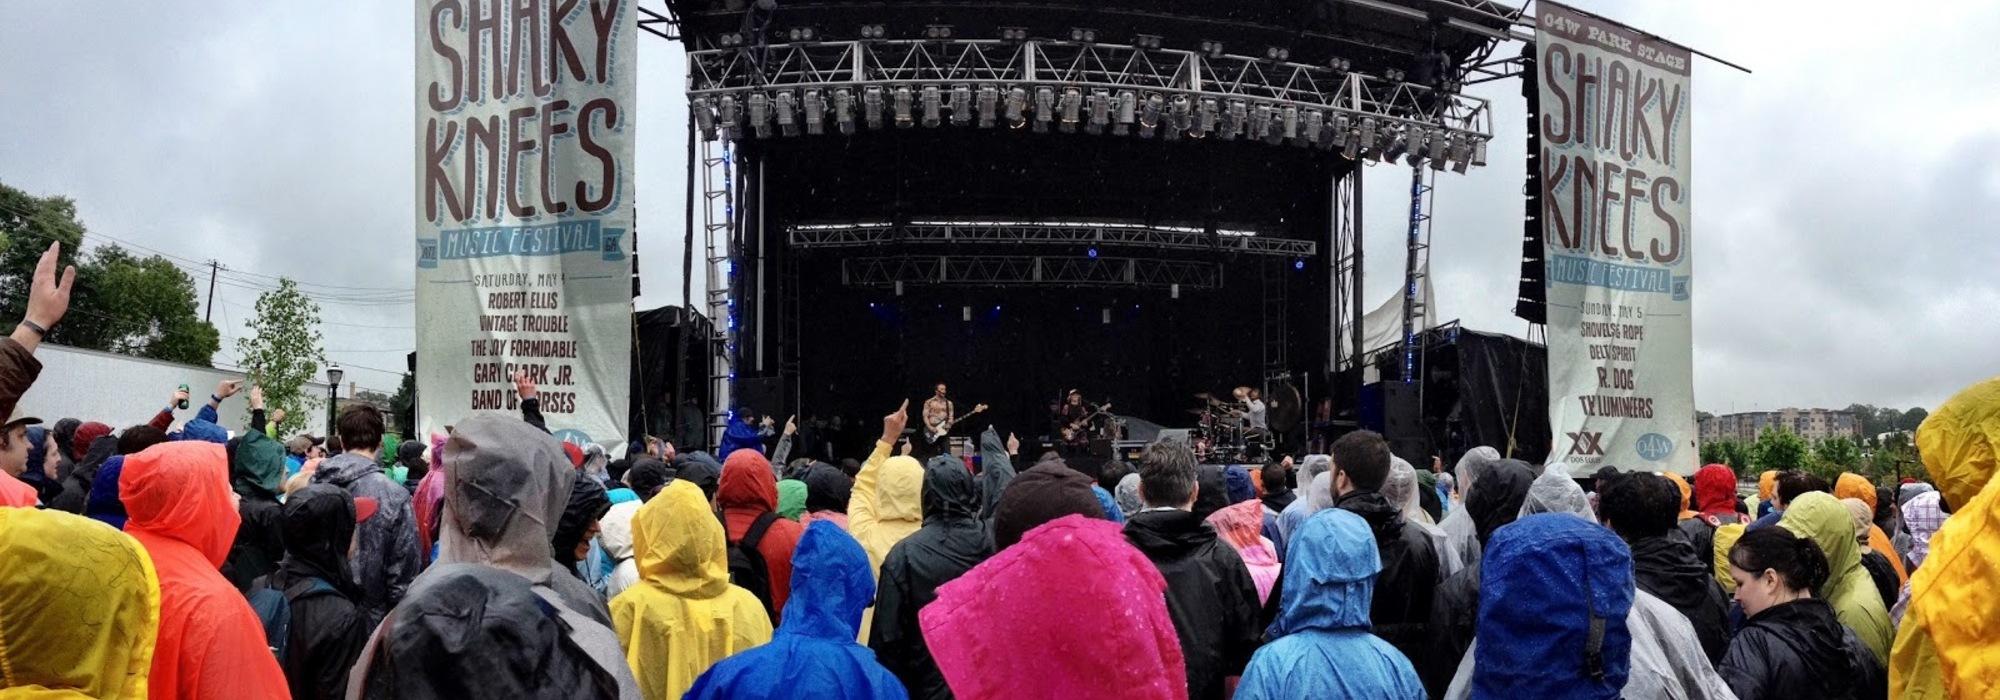 A Shaky Knees Music Festival live event